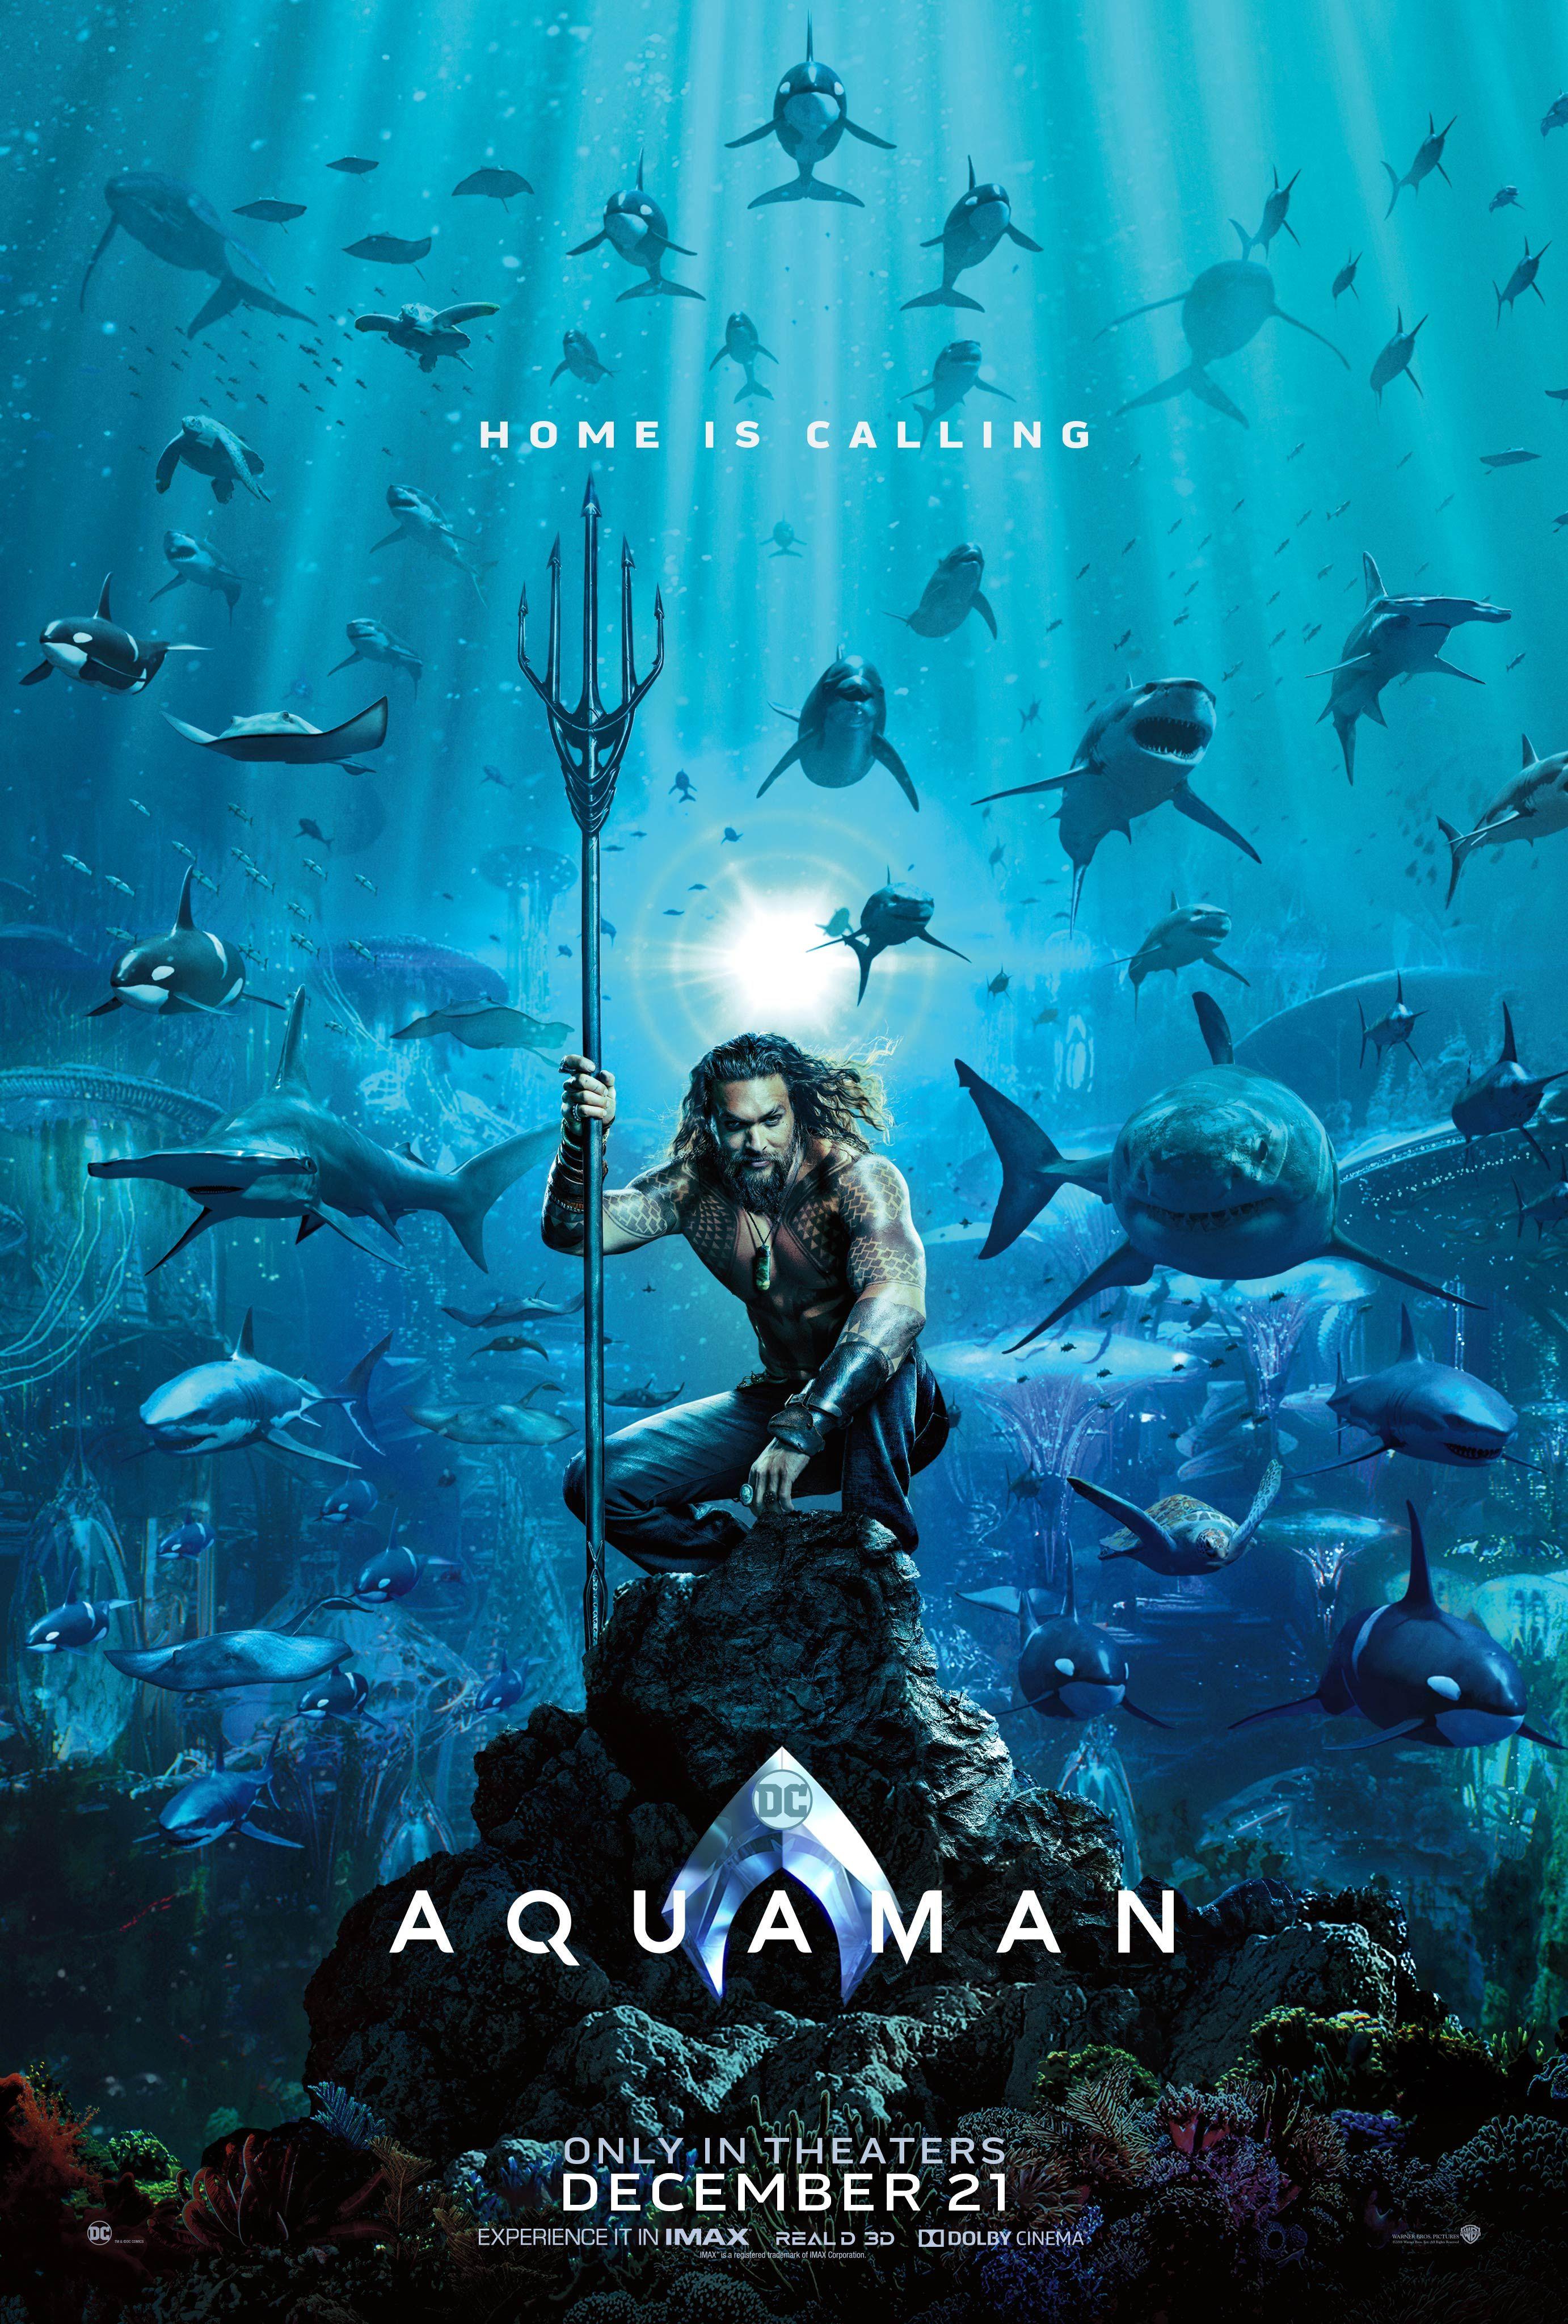 Aquaman Film Streaming Vf : aquaman, streaming, First, Aquaman, Poster, Film,, Movies, Online,